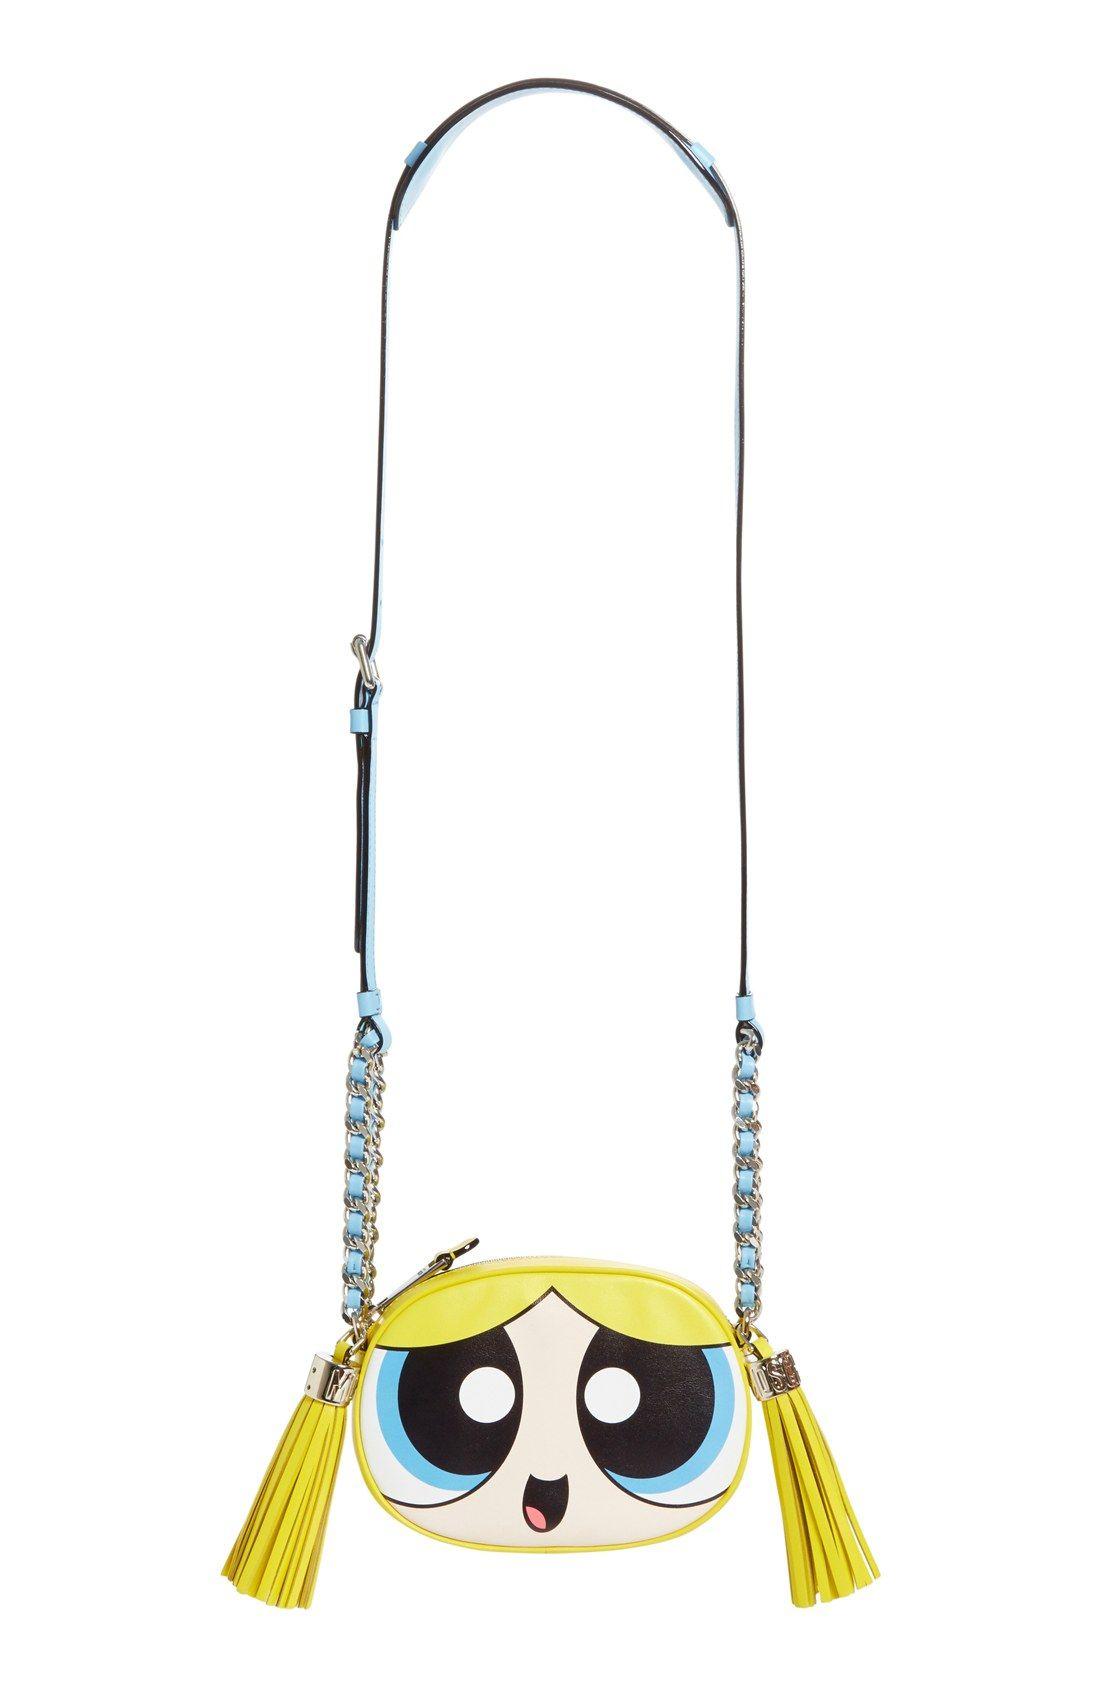 dd2421b3da Moschino 'The Powerpuff Girls® - Bubbles' Canteen Crossbody Bag ...